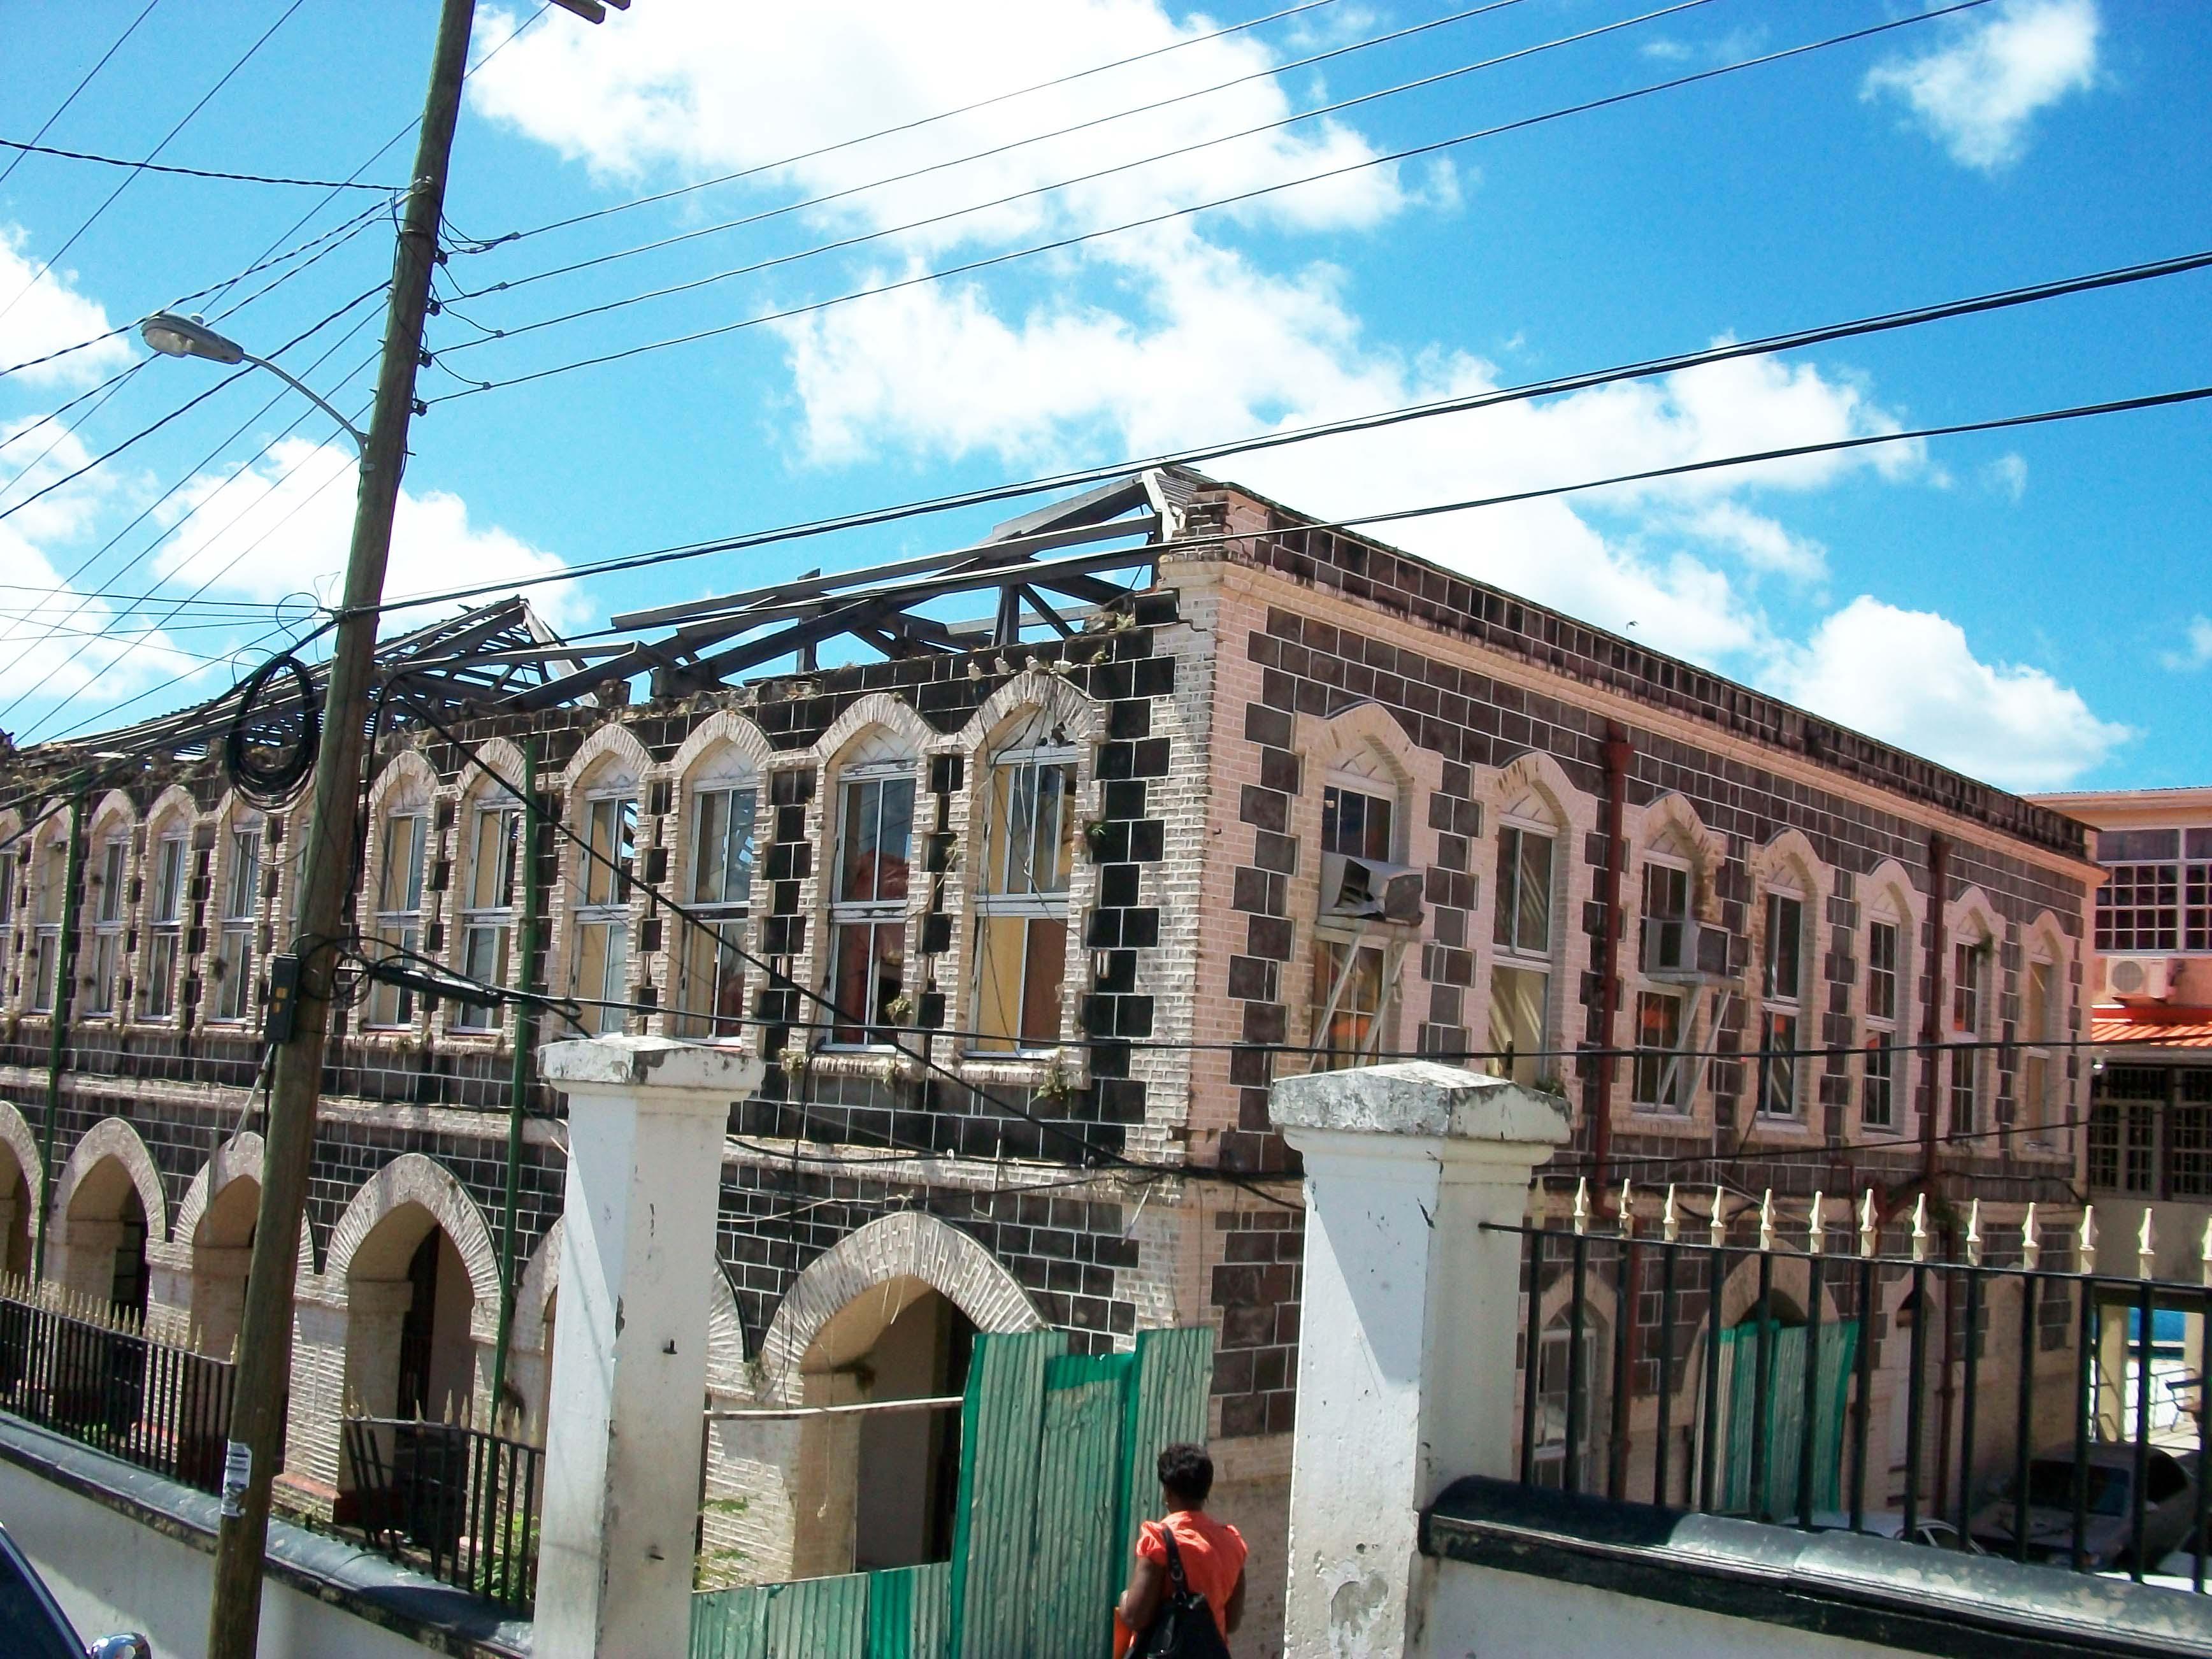 February 2011 Grenada National Archives